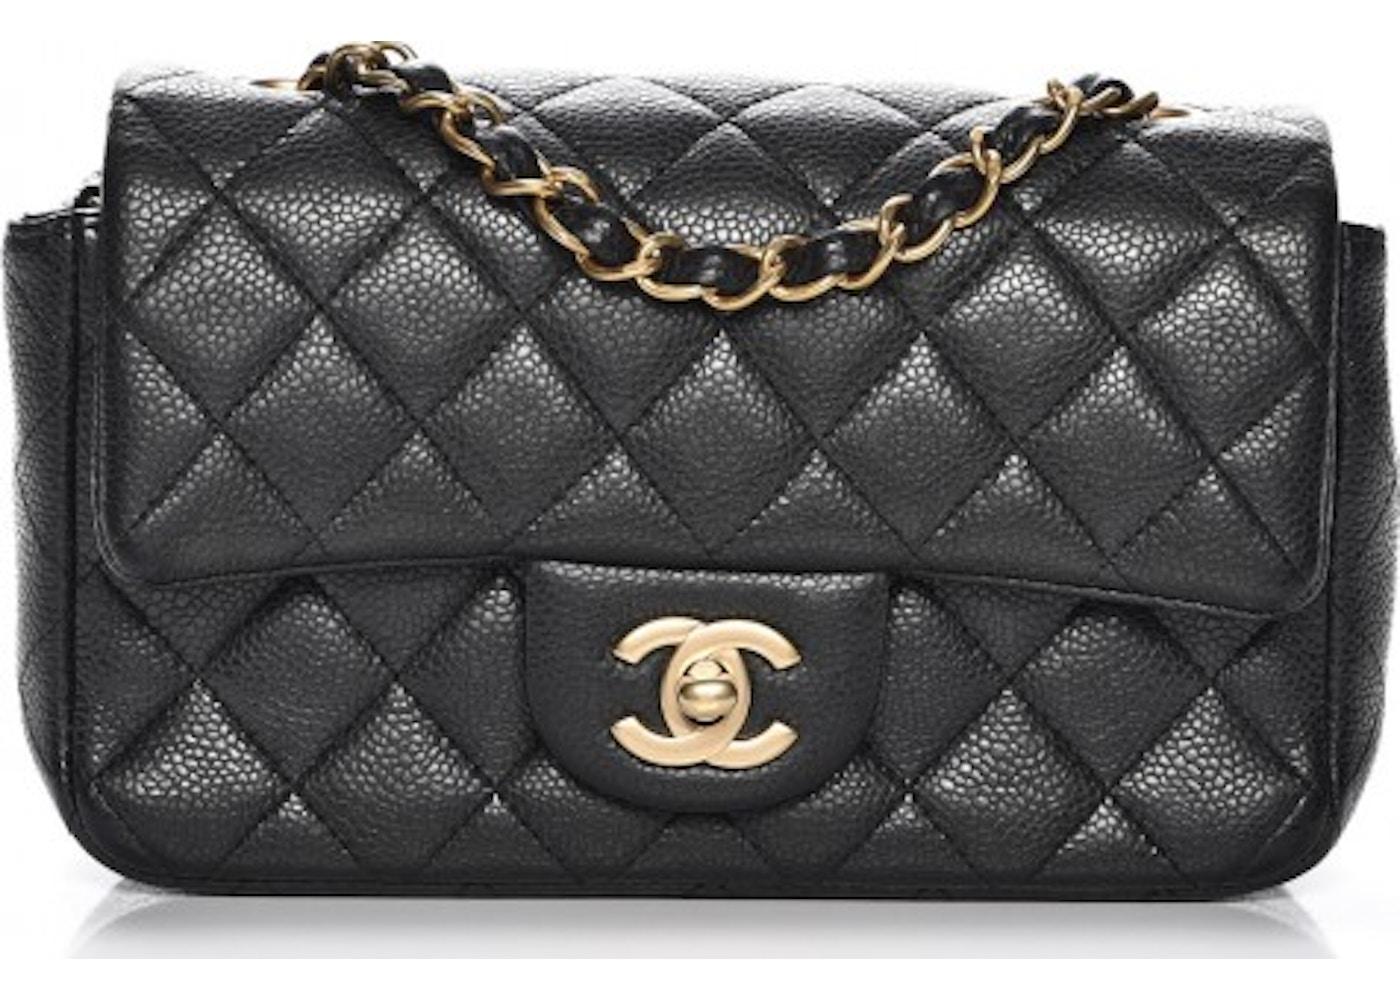 72d10626989d Chanel Rectangular Flap Quilted Diamond Mini Black. Quilted Diamond Mini  Black